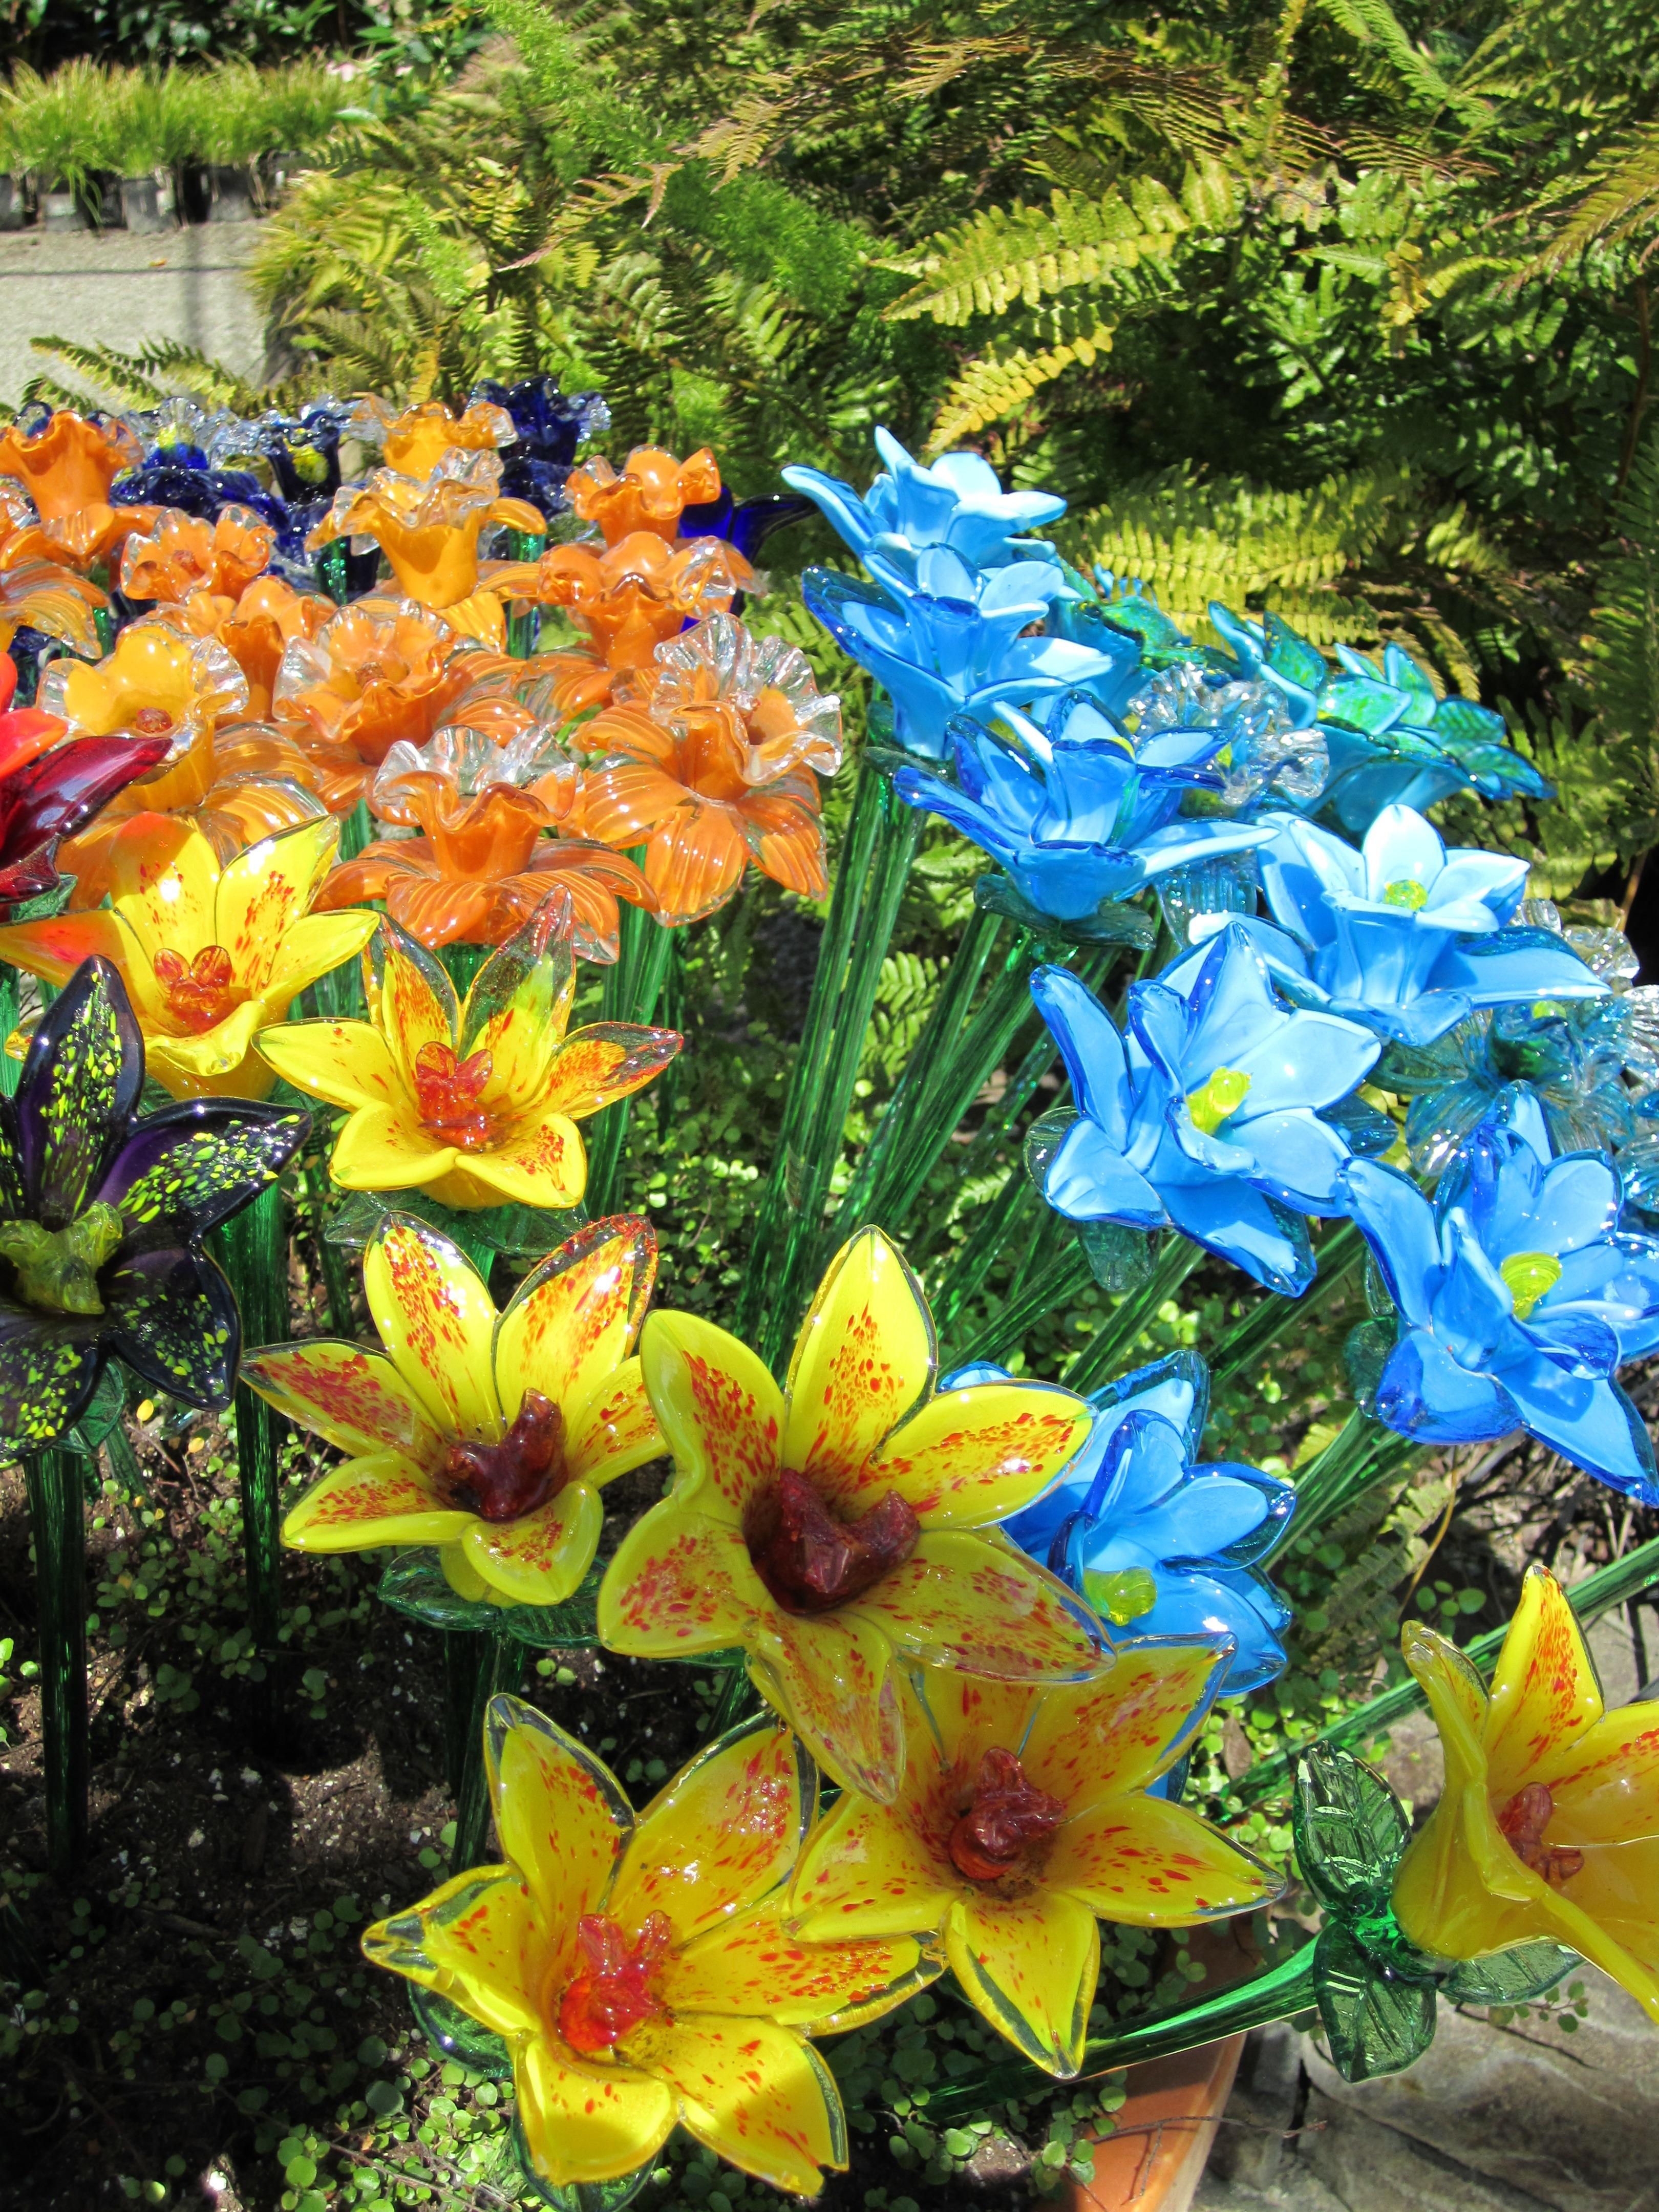 Free Images : blossom, flower, petal, glass, floral, bouquet ...